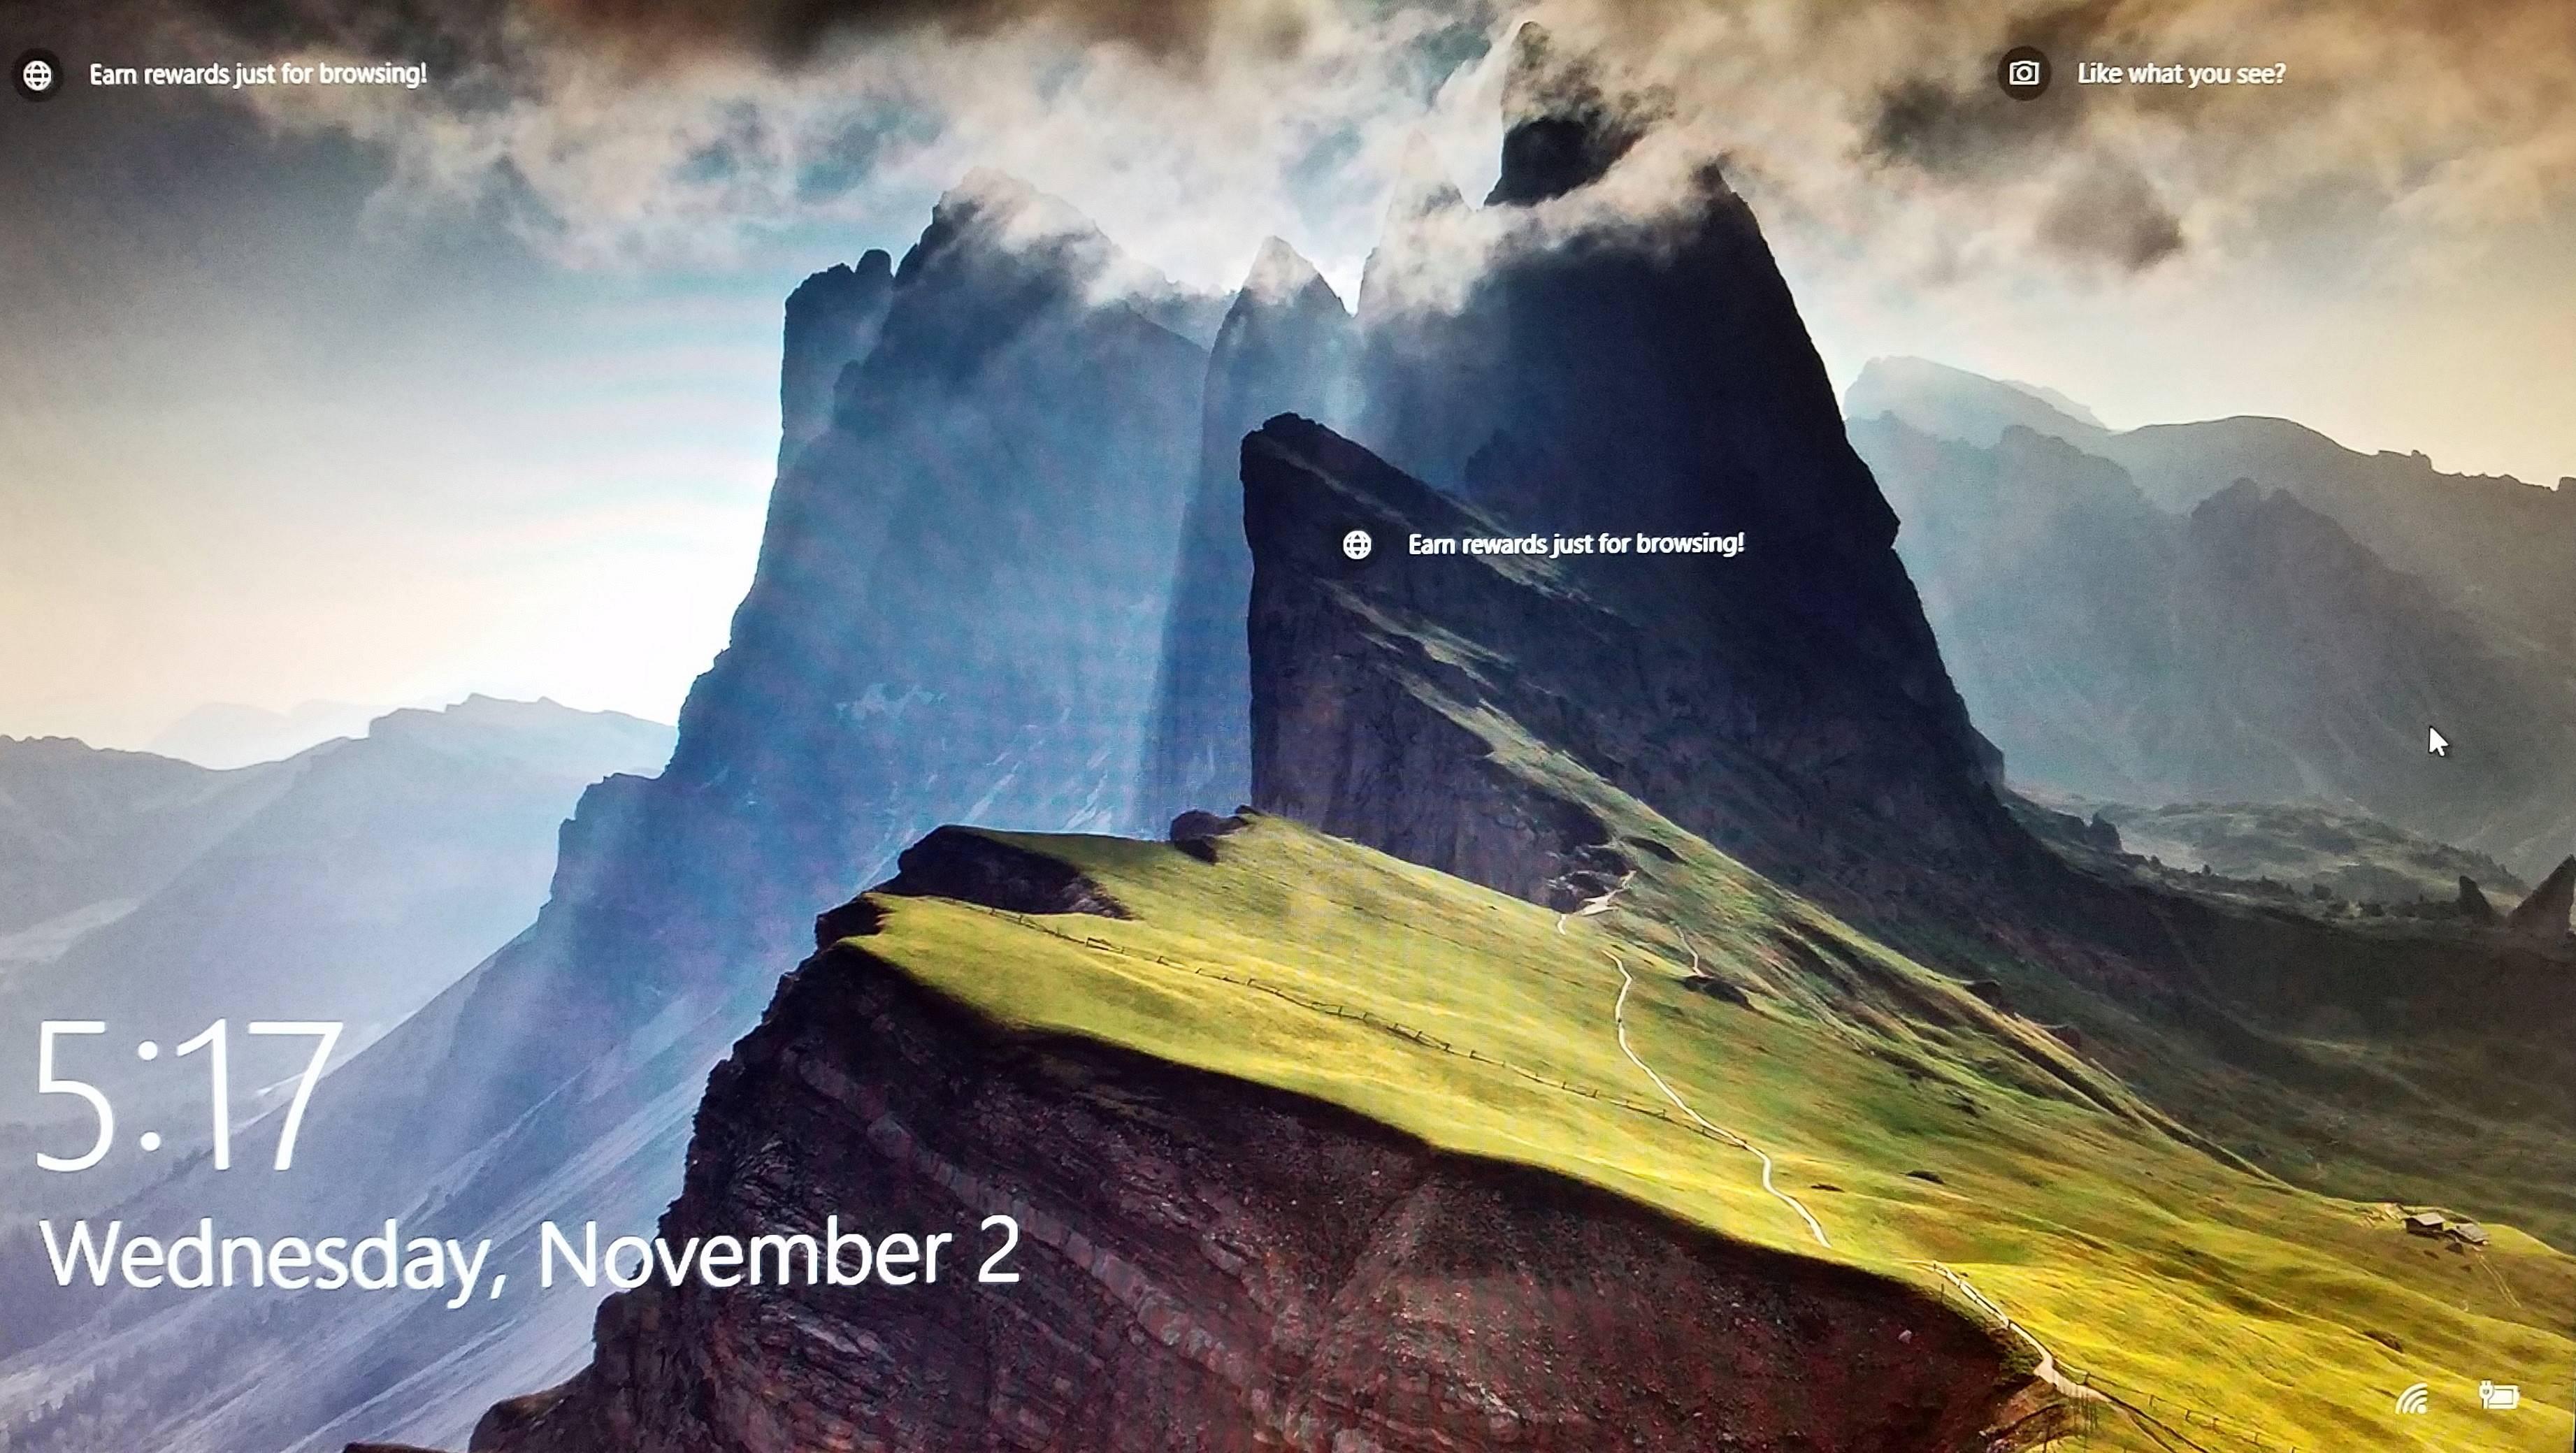 Windows 10 Desktop Background - Windows 10 Background Locations - HD Wallpaper